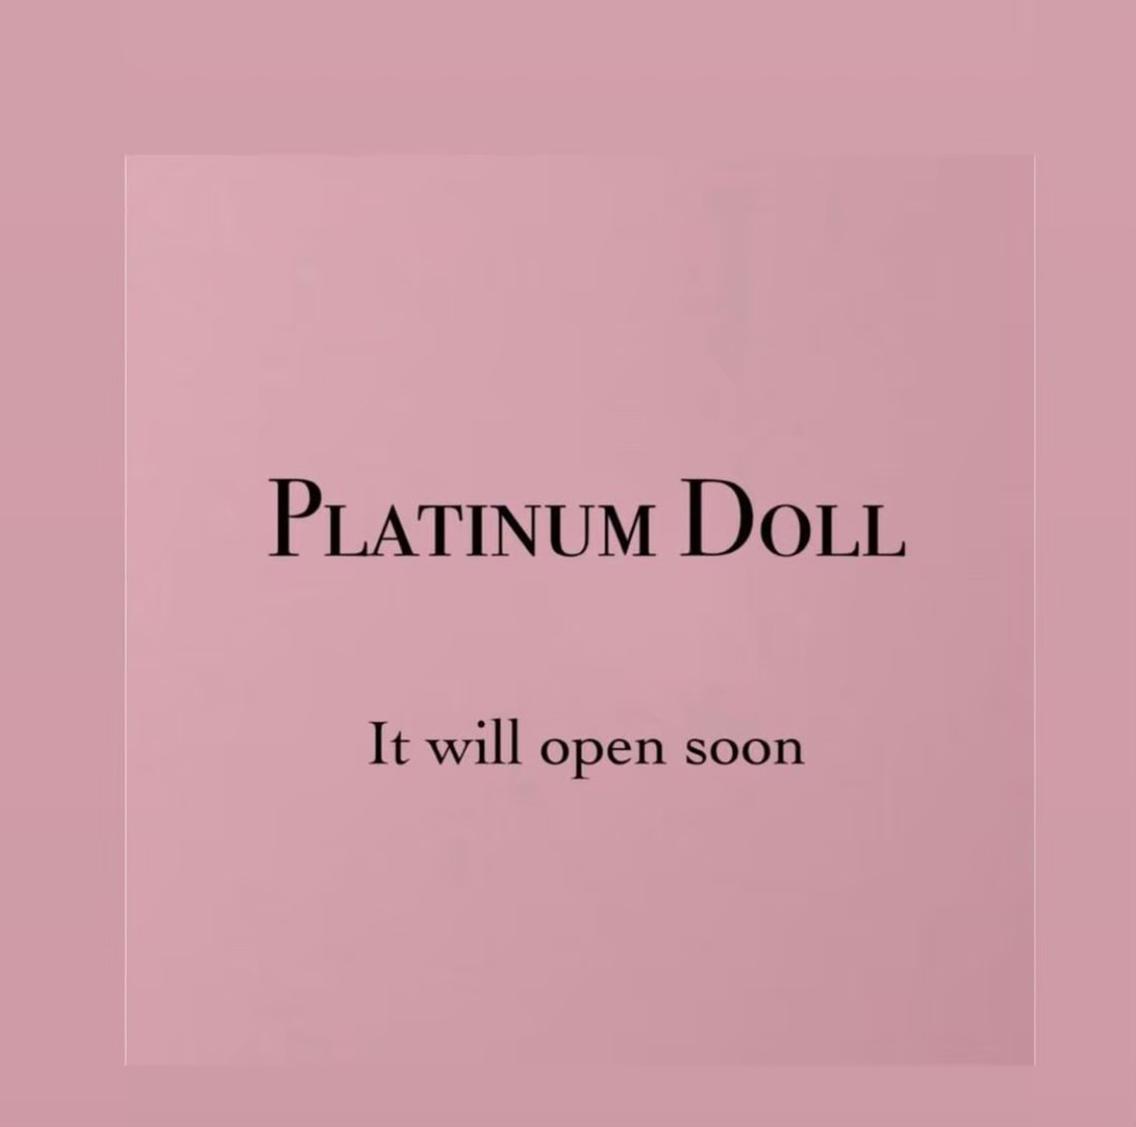 PLATINUMDOLL所属・🤍PLATINUM D♡LL松尾みき🤍の掲載